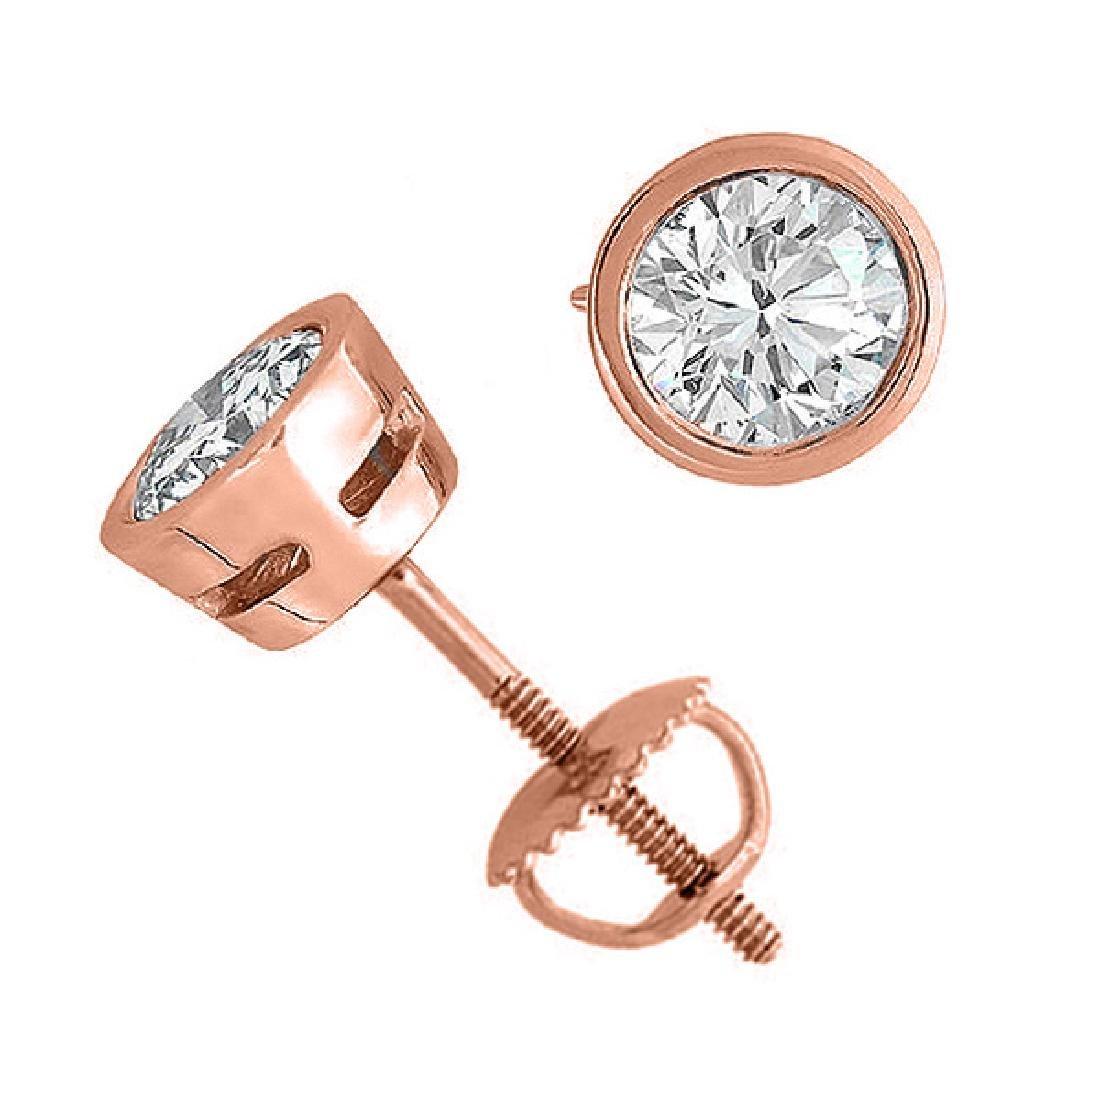 14K Rose Gold Jewelry 2.03 ctw Natural Diamond Stud